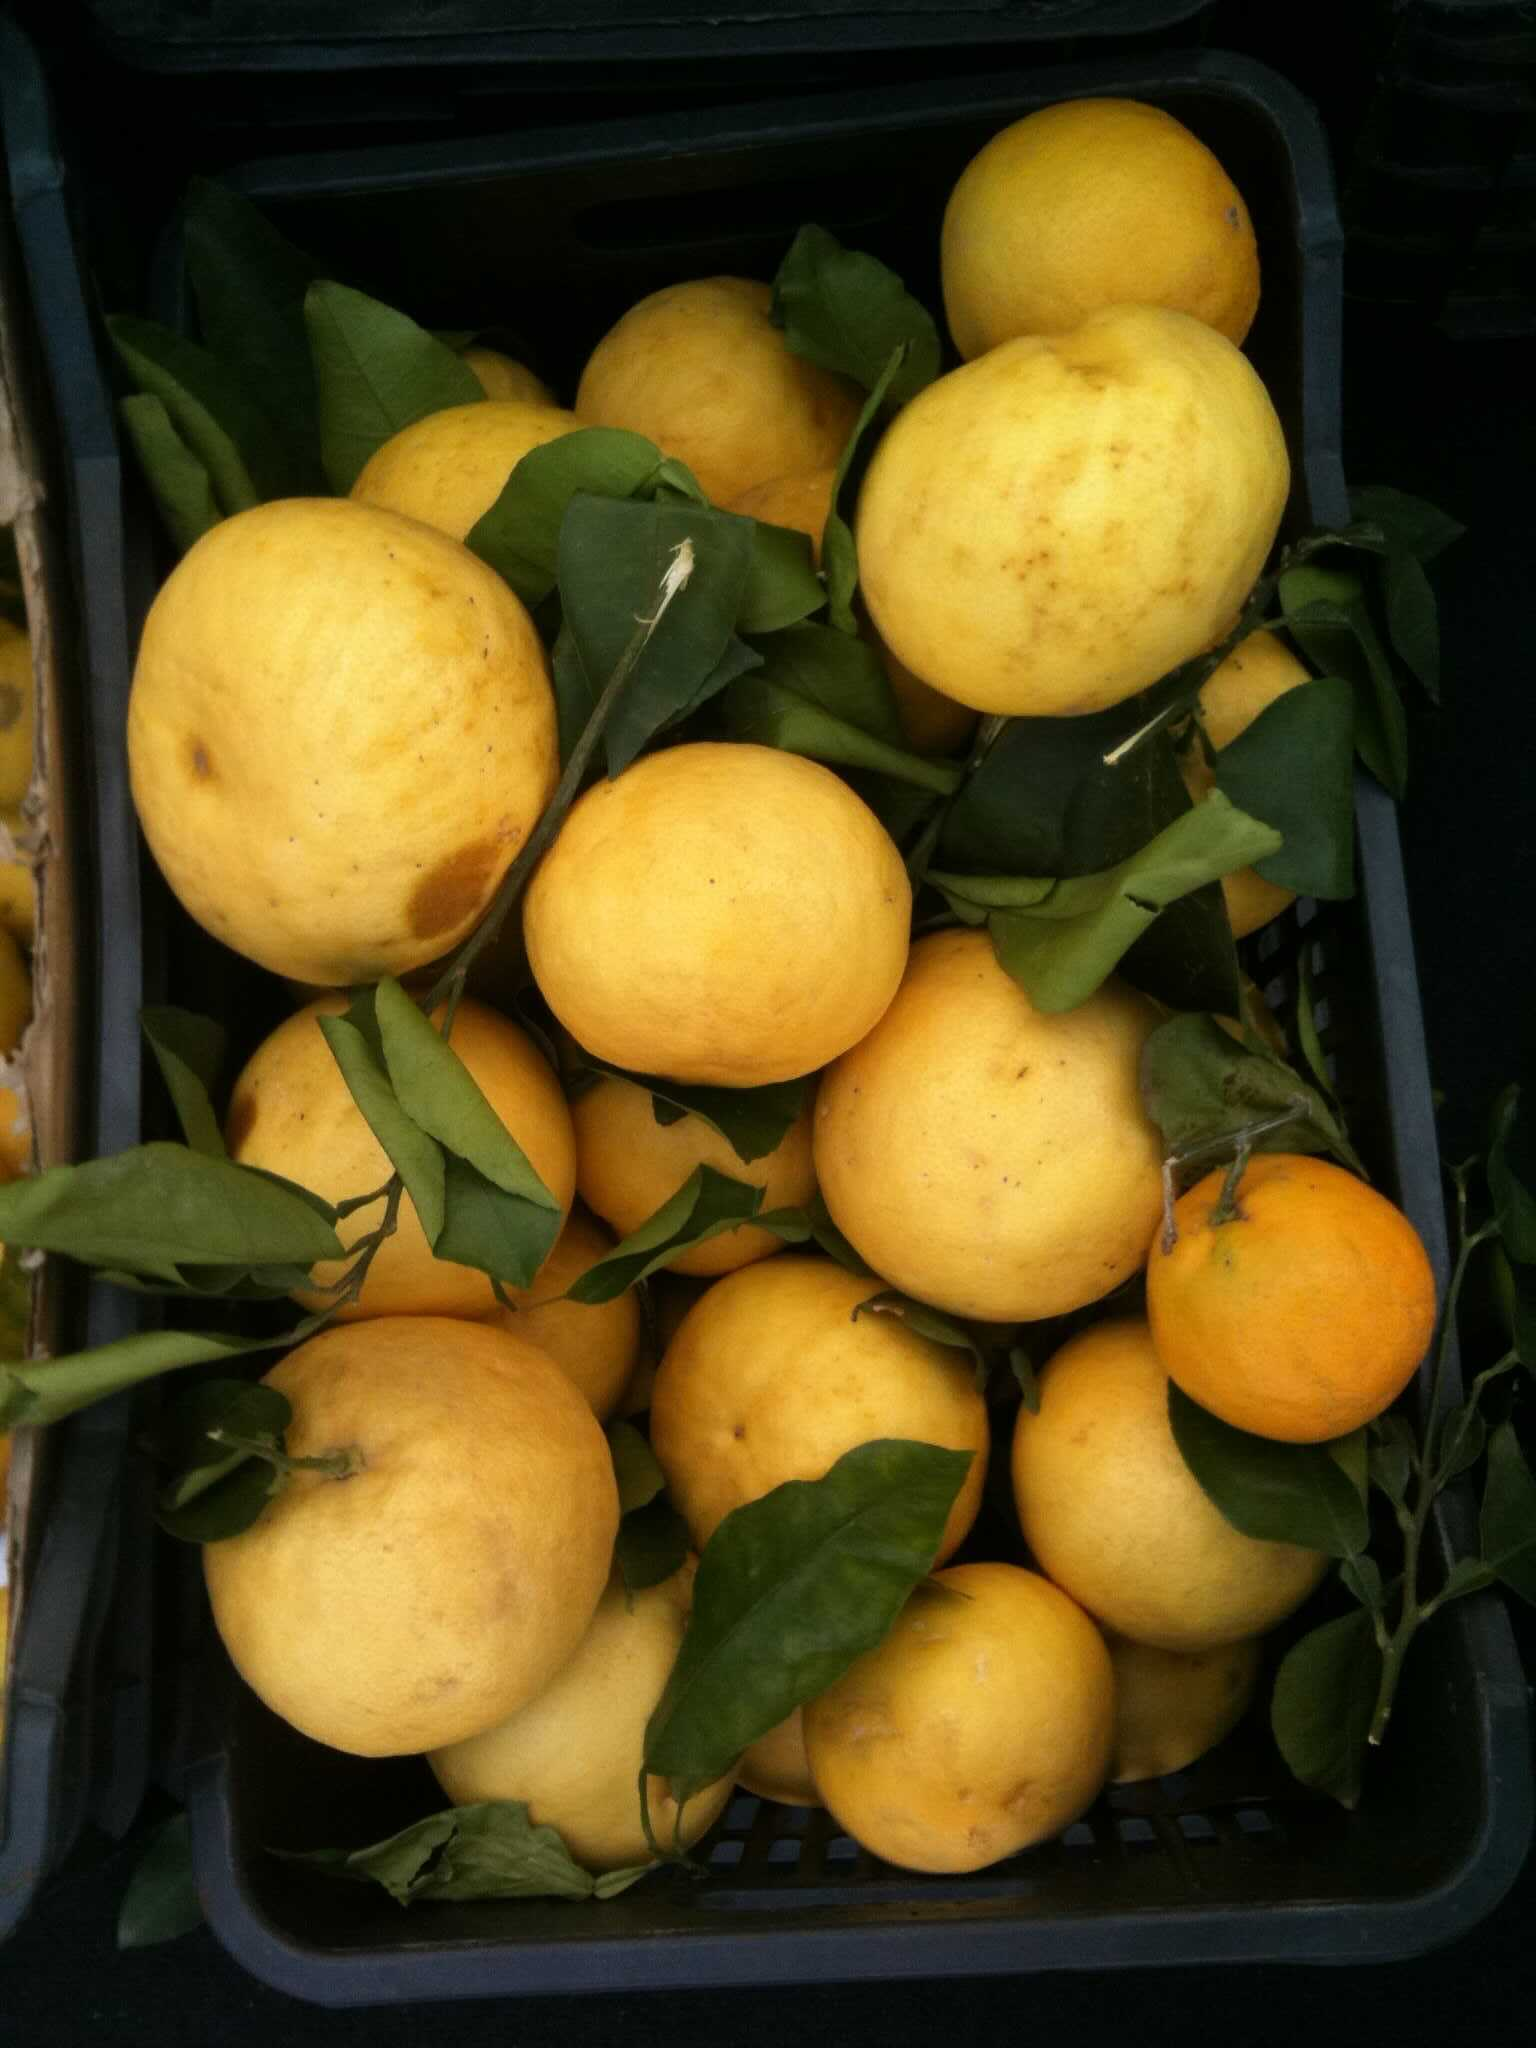 fresh yellow lemons From farmers market